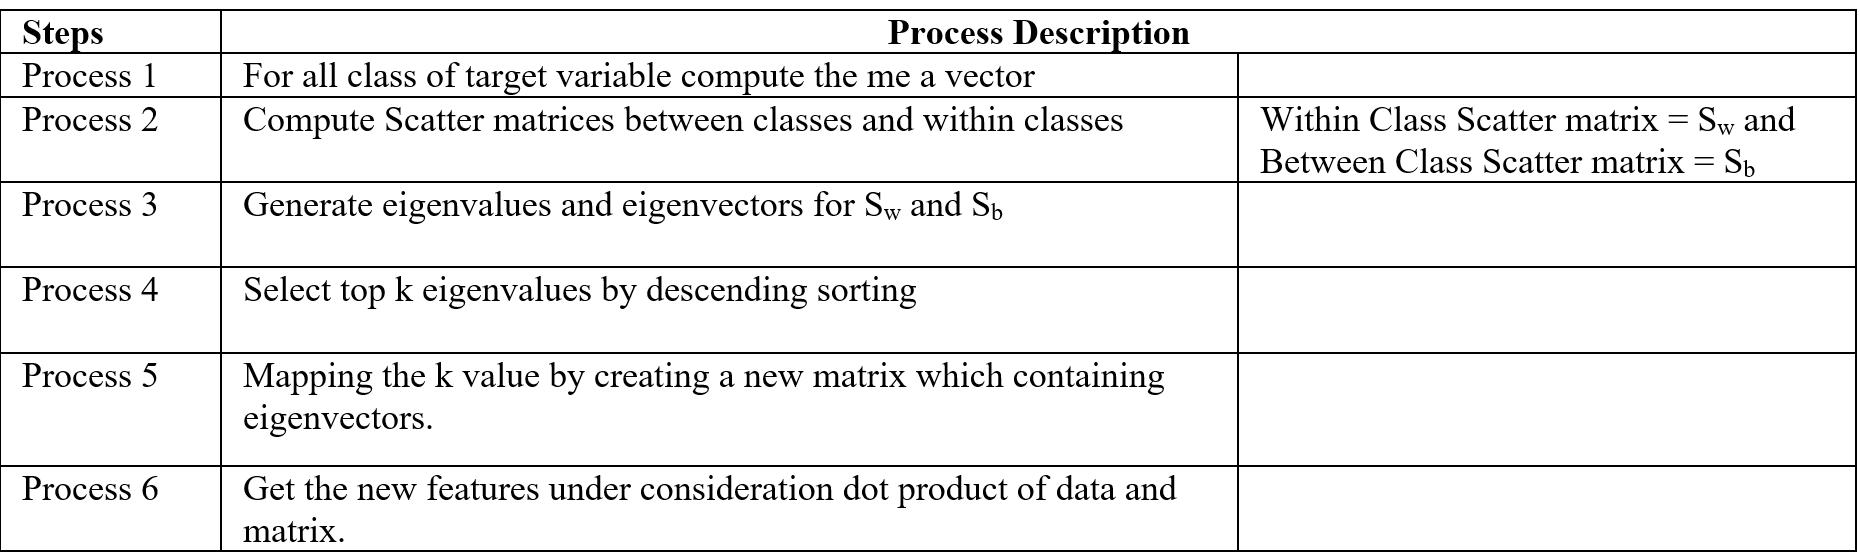 LDA Process